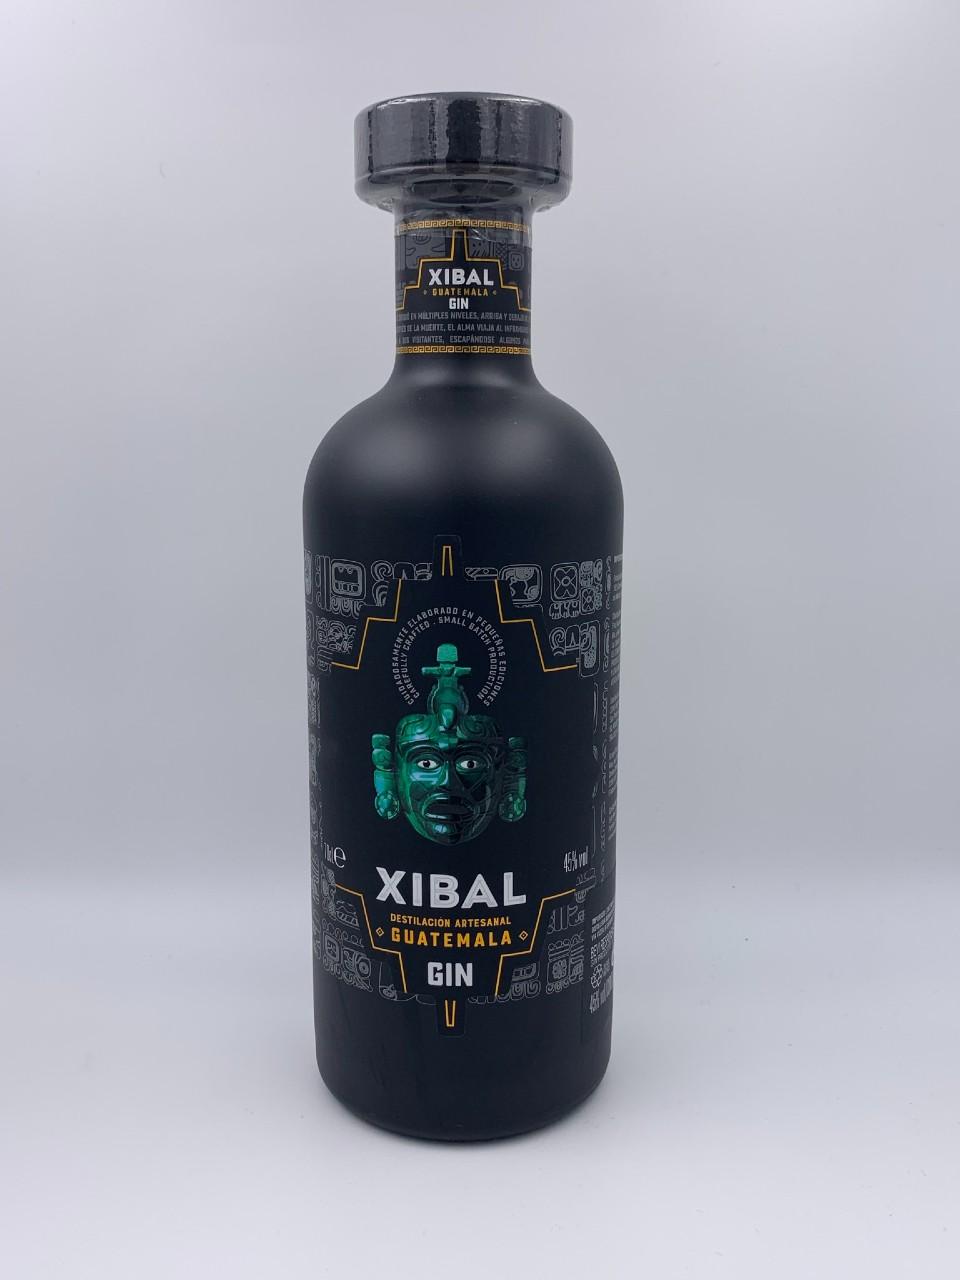 Xibal Gin Guatemala Handcrafted Premium